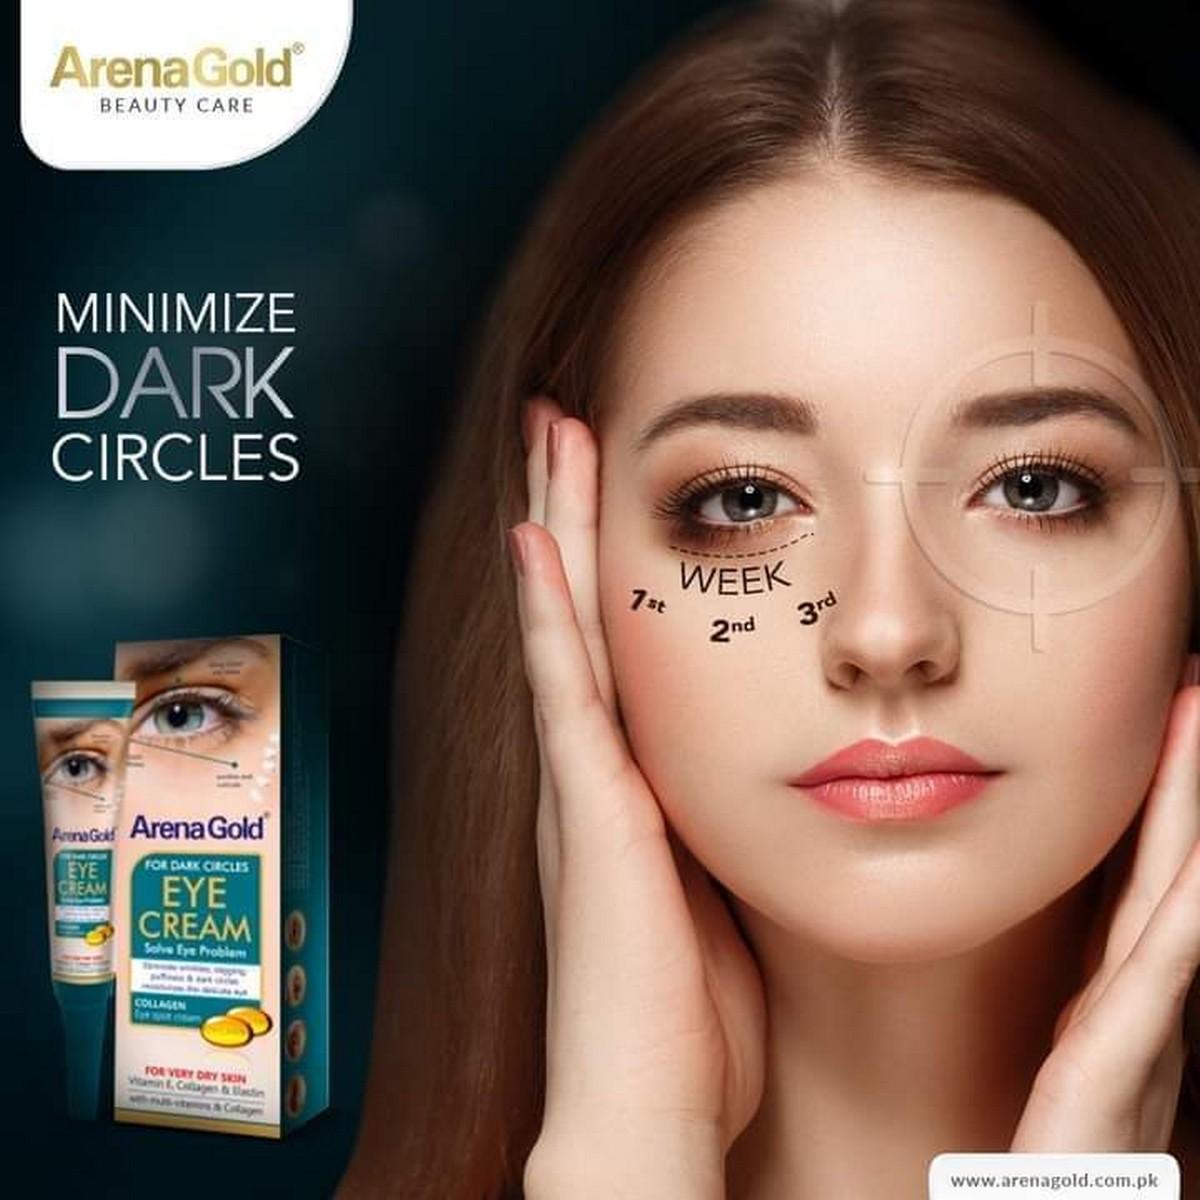 ARENA GOLD EYE CREAM FOR DARK CIRCLES